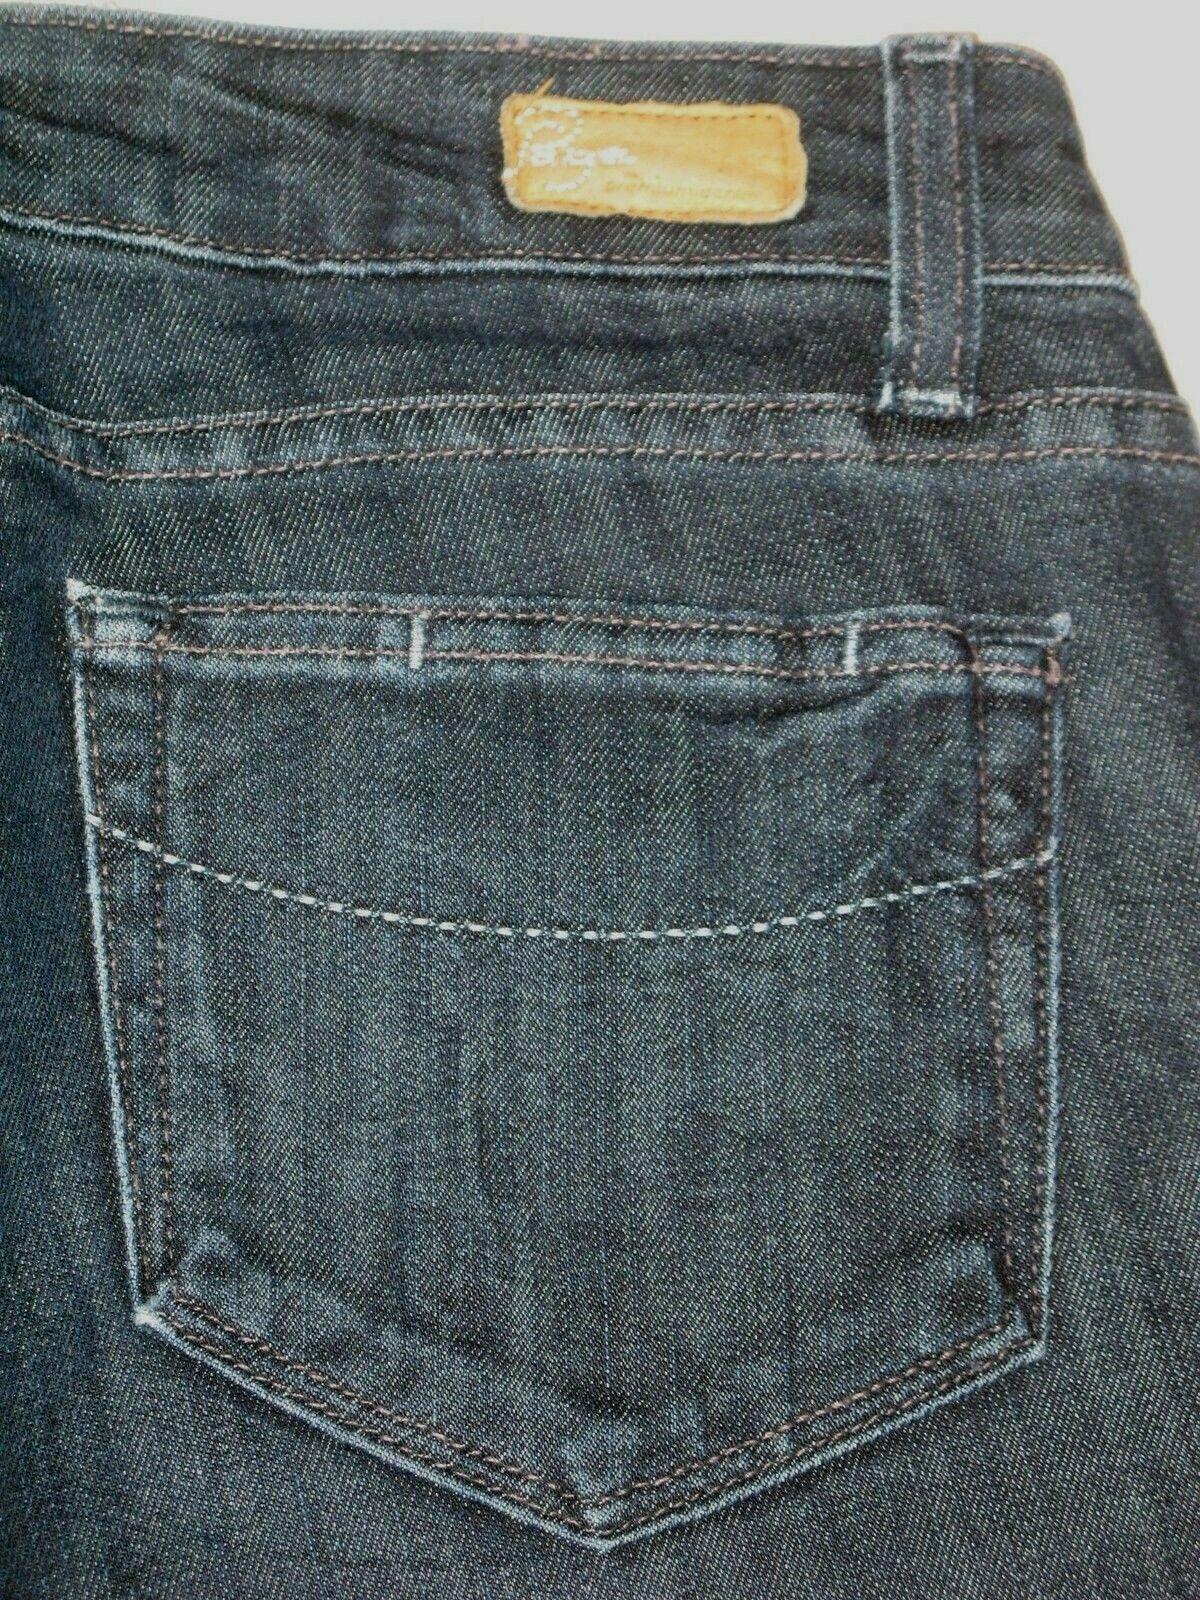 Paige Benedict Canyon Bootcut Jeans Sz 26 CLassic Rise Dark w Stretch L 33.5